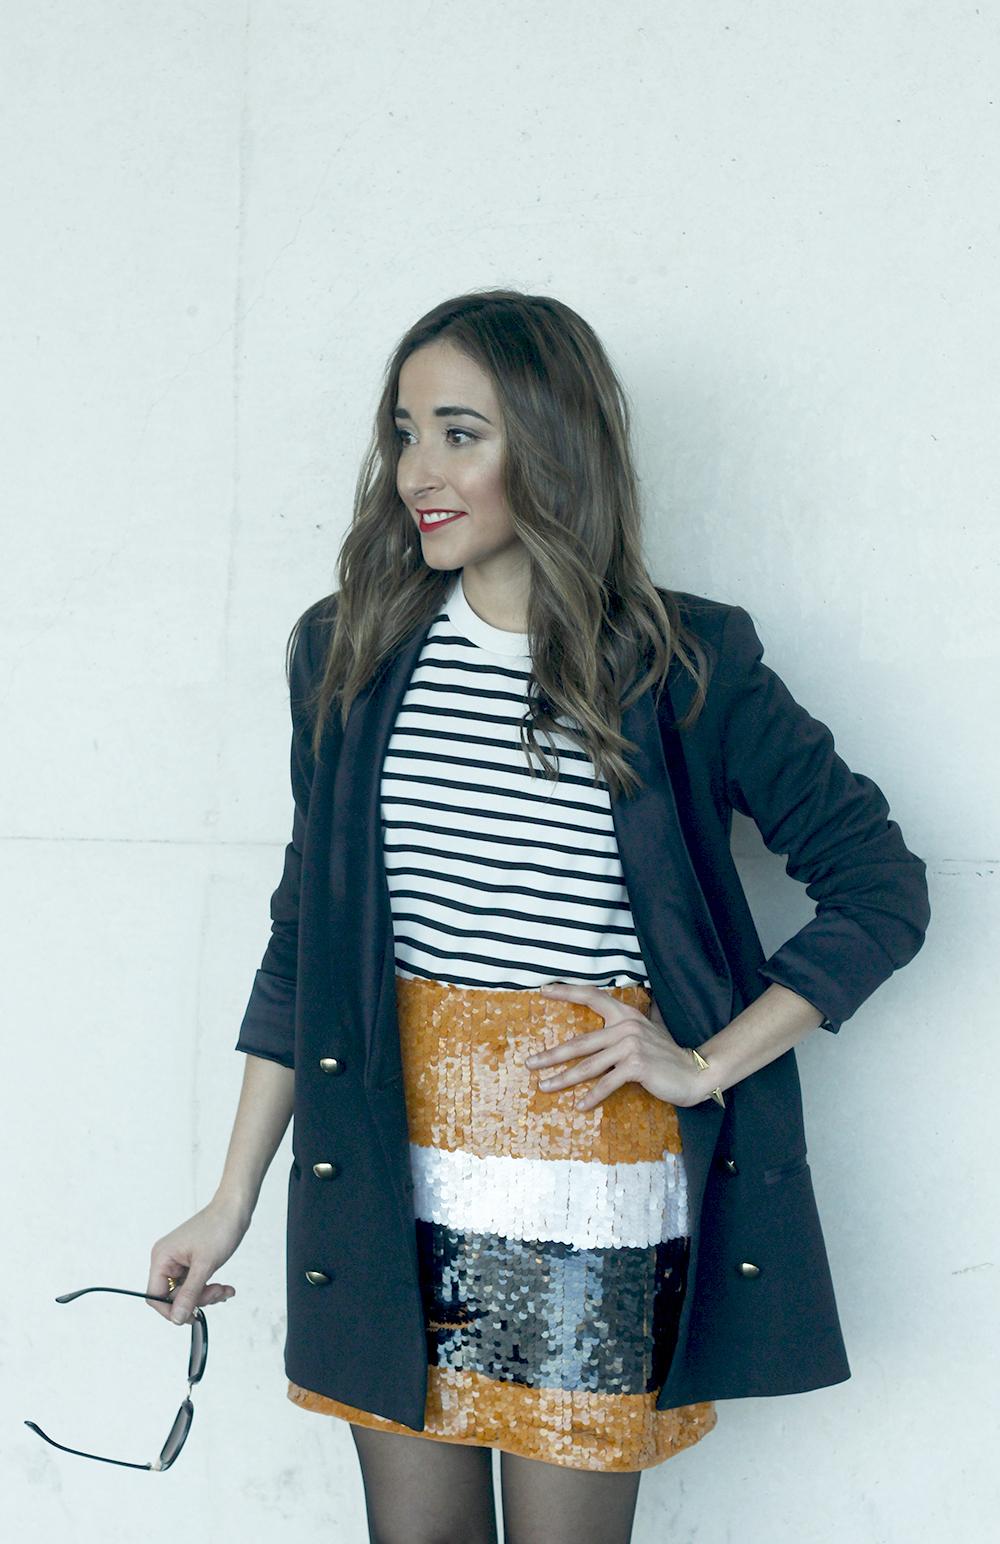 Striped T-Shirt Sequin skirt black blazer madrid fashion week street style fashion outfit04.jpg04